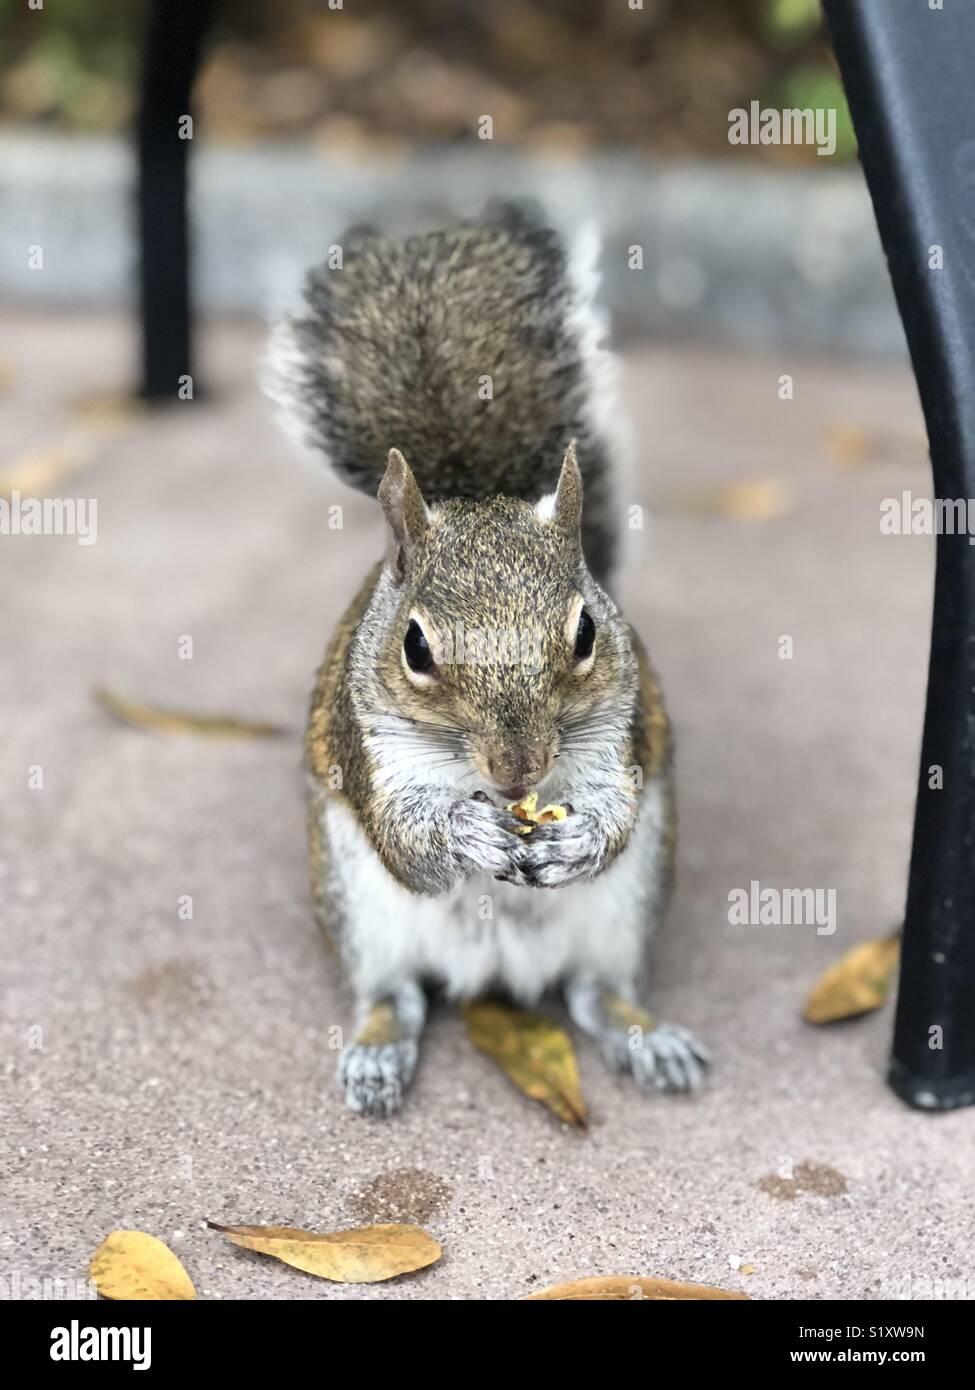 Squirrel eating popcorn - Stock Image